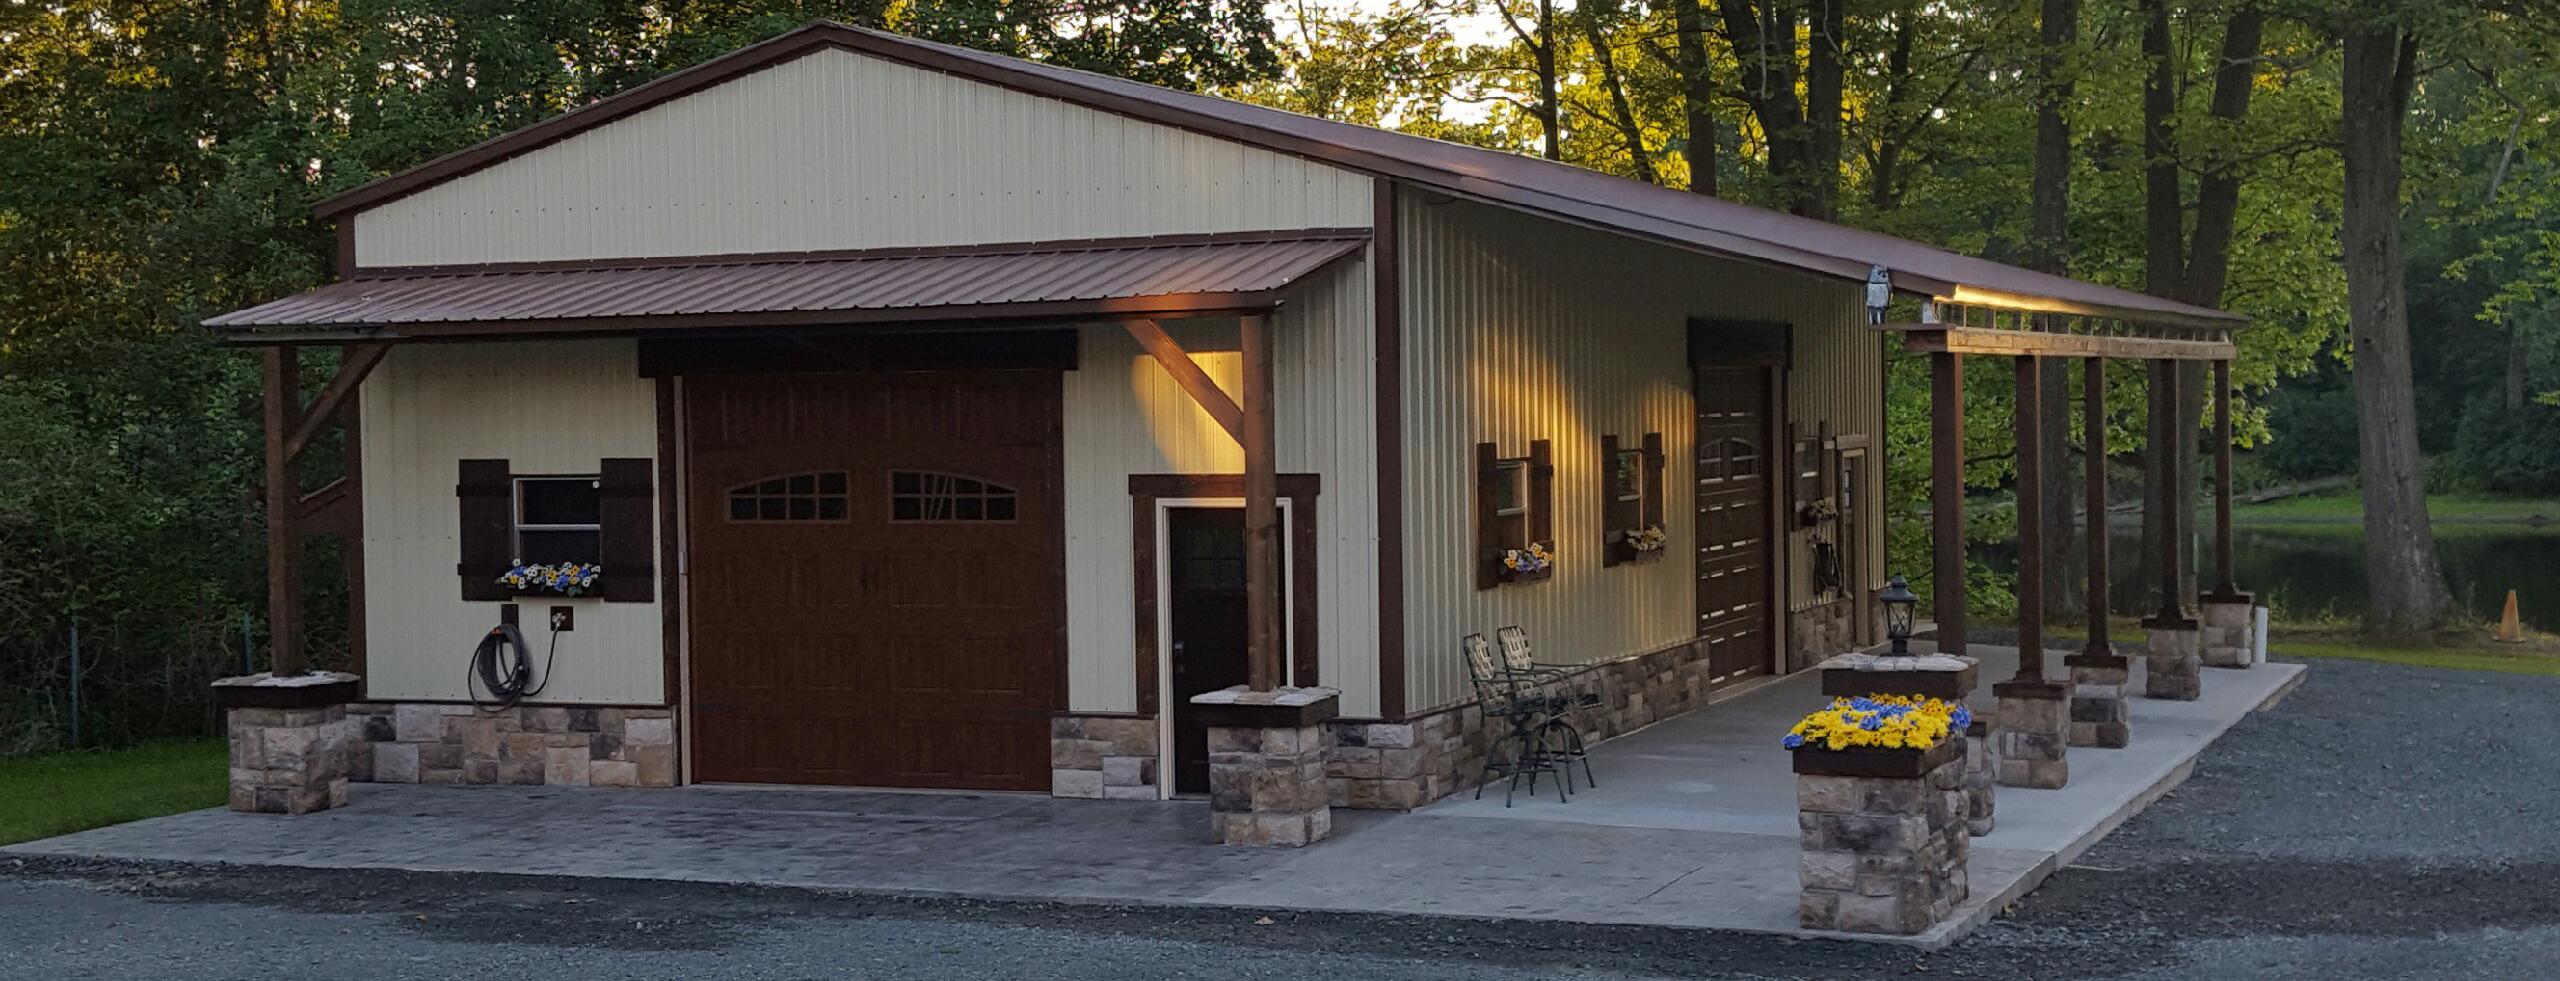 Joe's Carports and Metal Buildings |Mechanicville NY